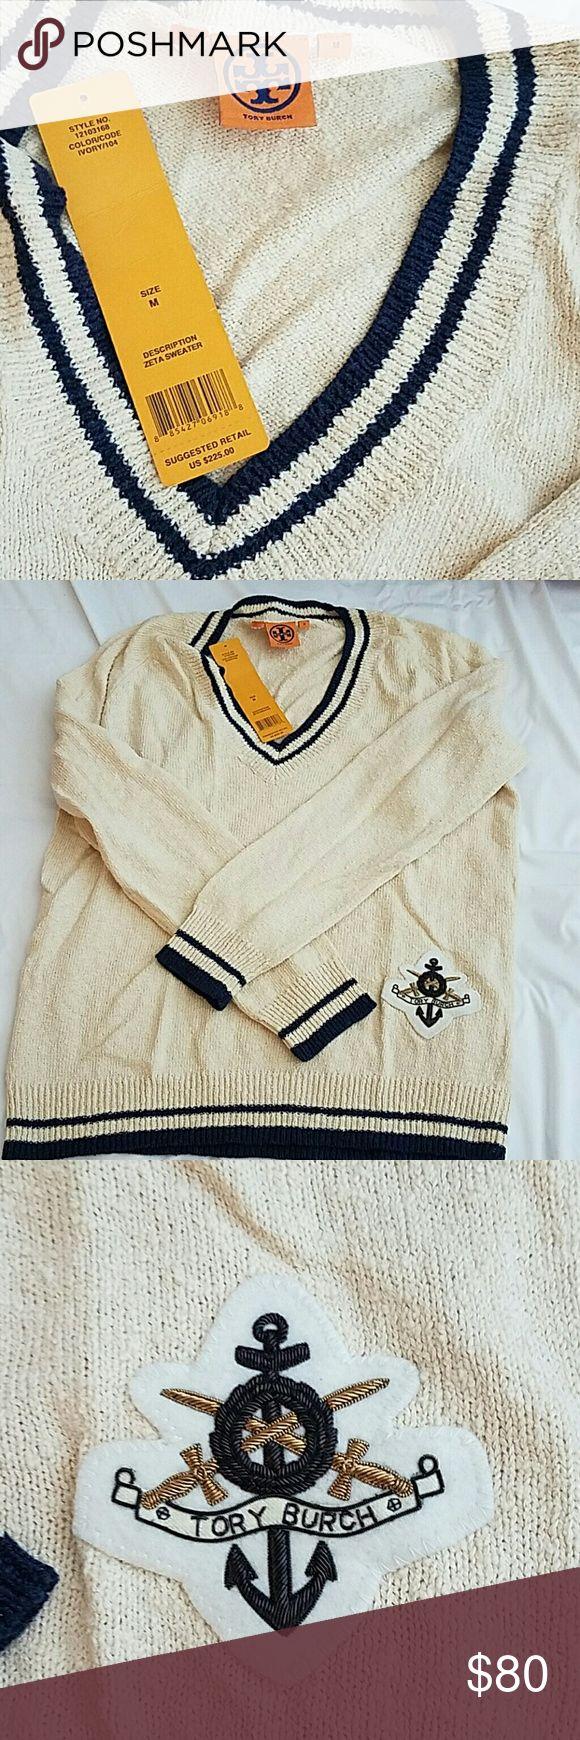 Tory Burch nautical/collegiate sweater NWT NWT